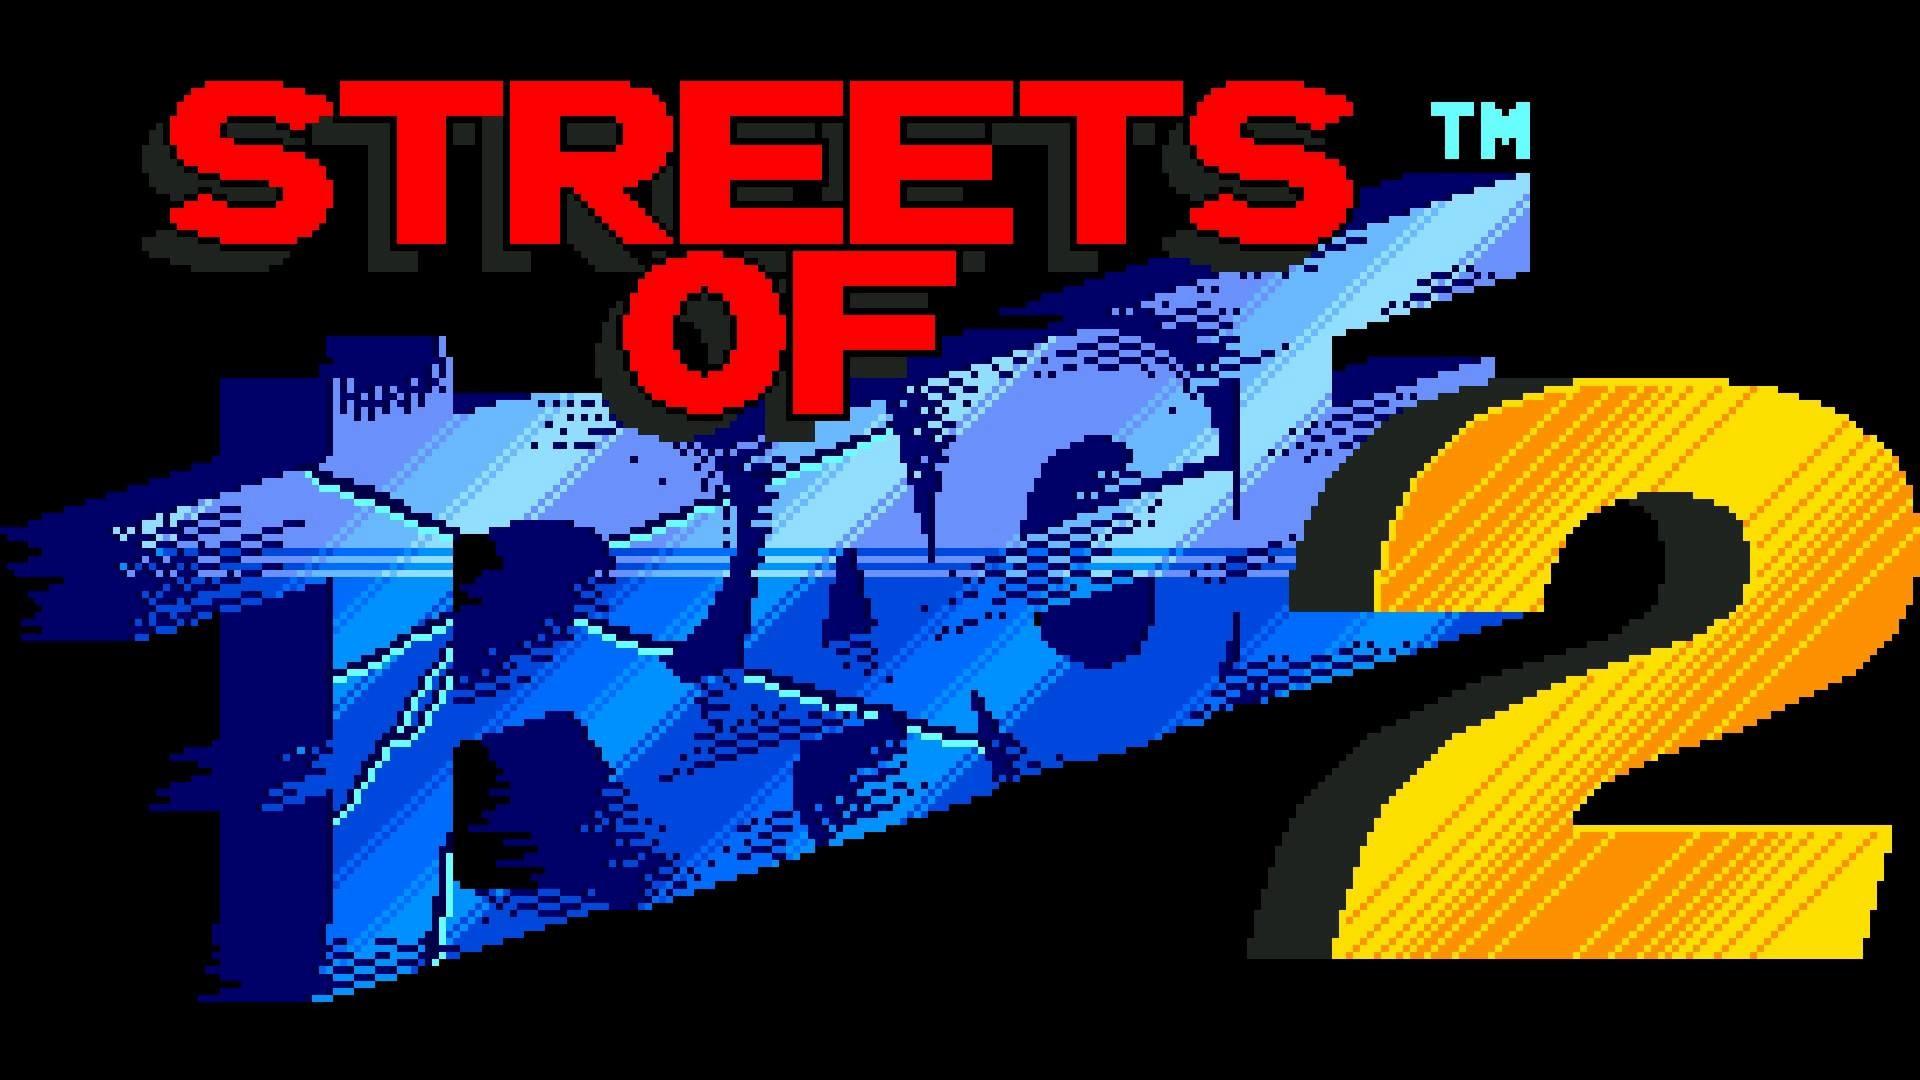 Dreamer – Streets of Rage 2 (Mega Drive/Genesis) Music Extended – YouTube